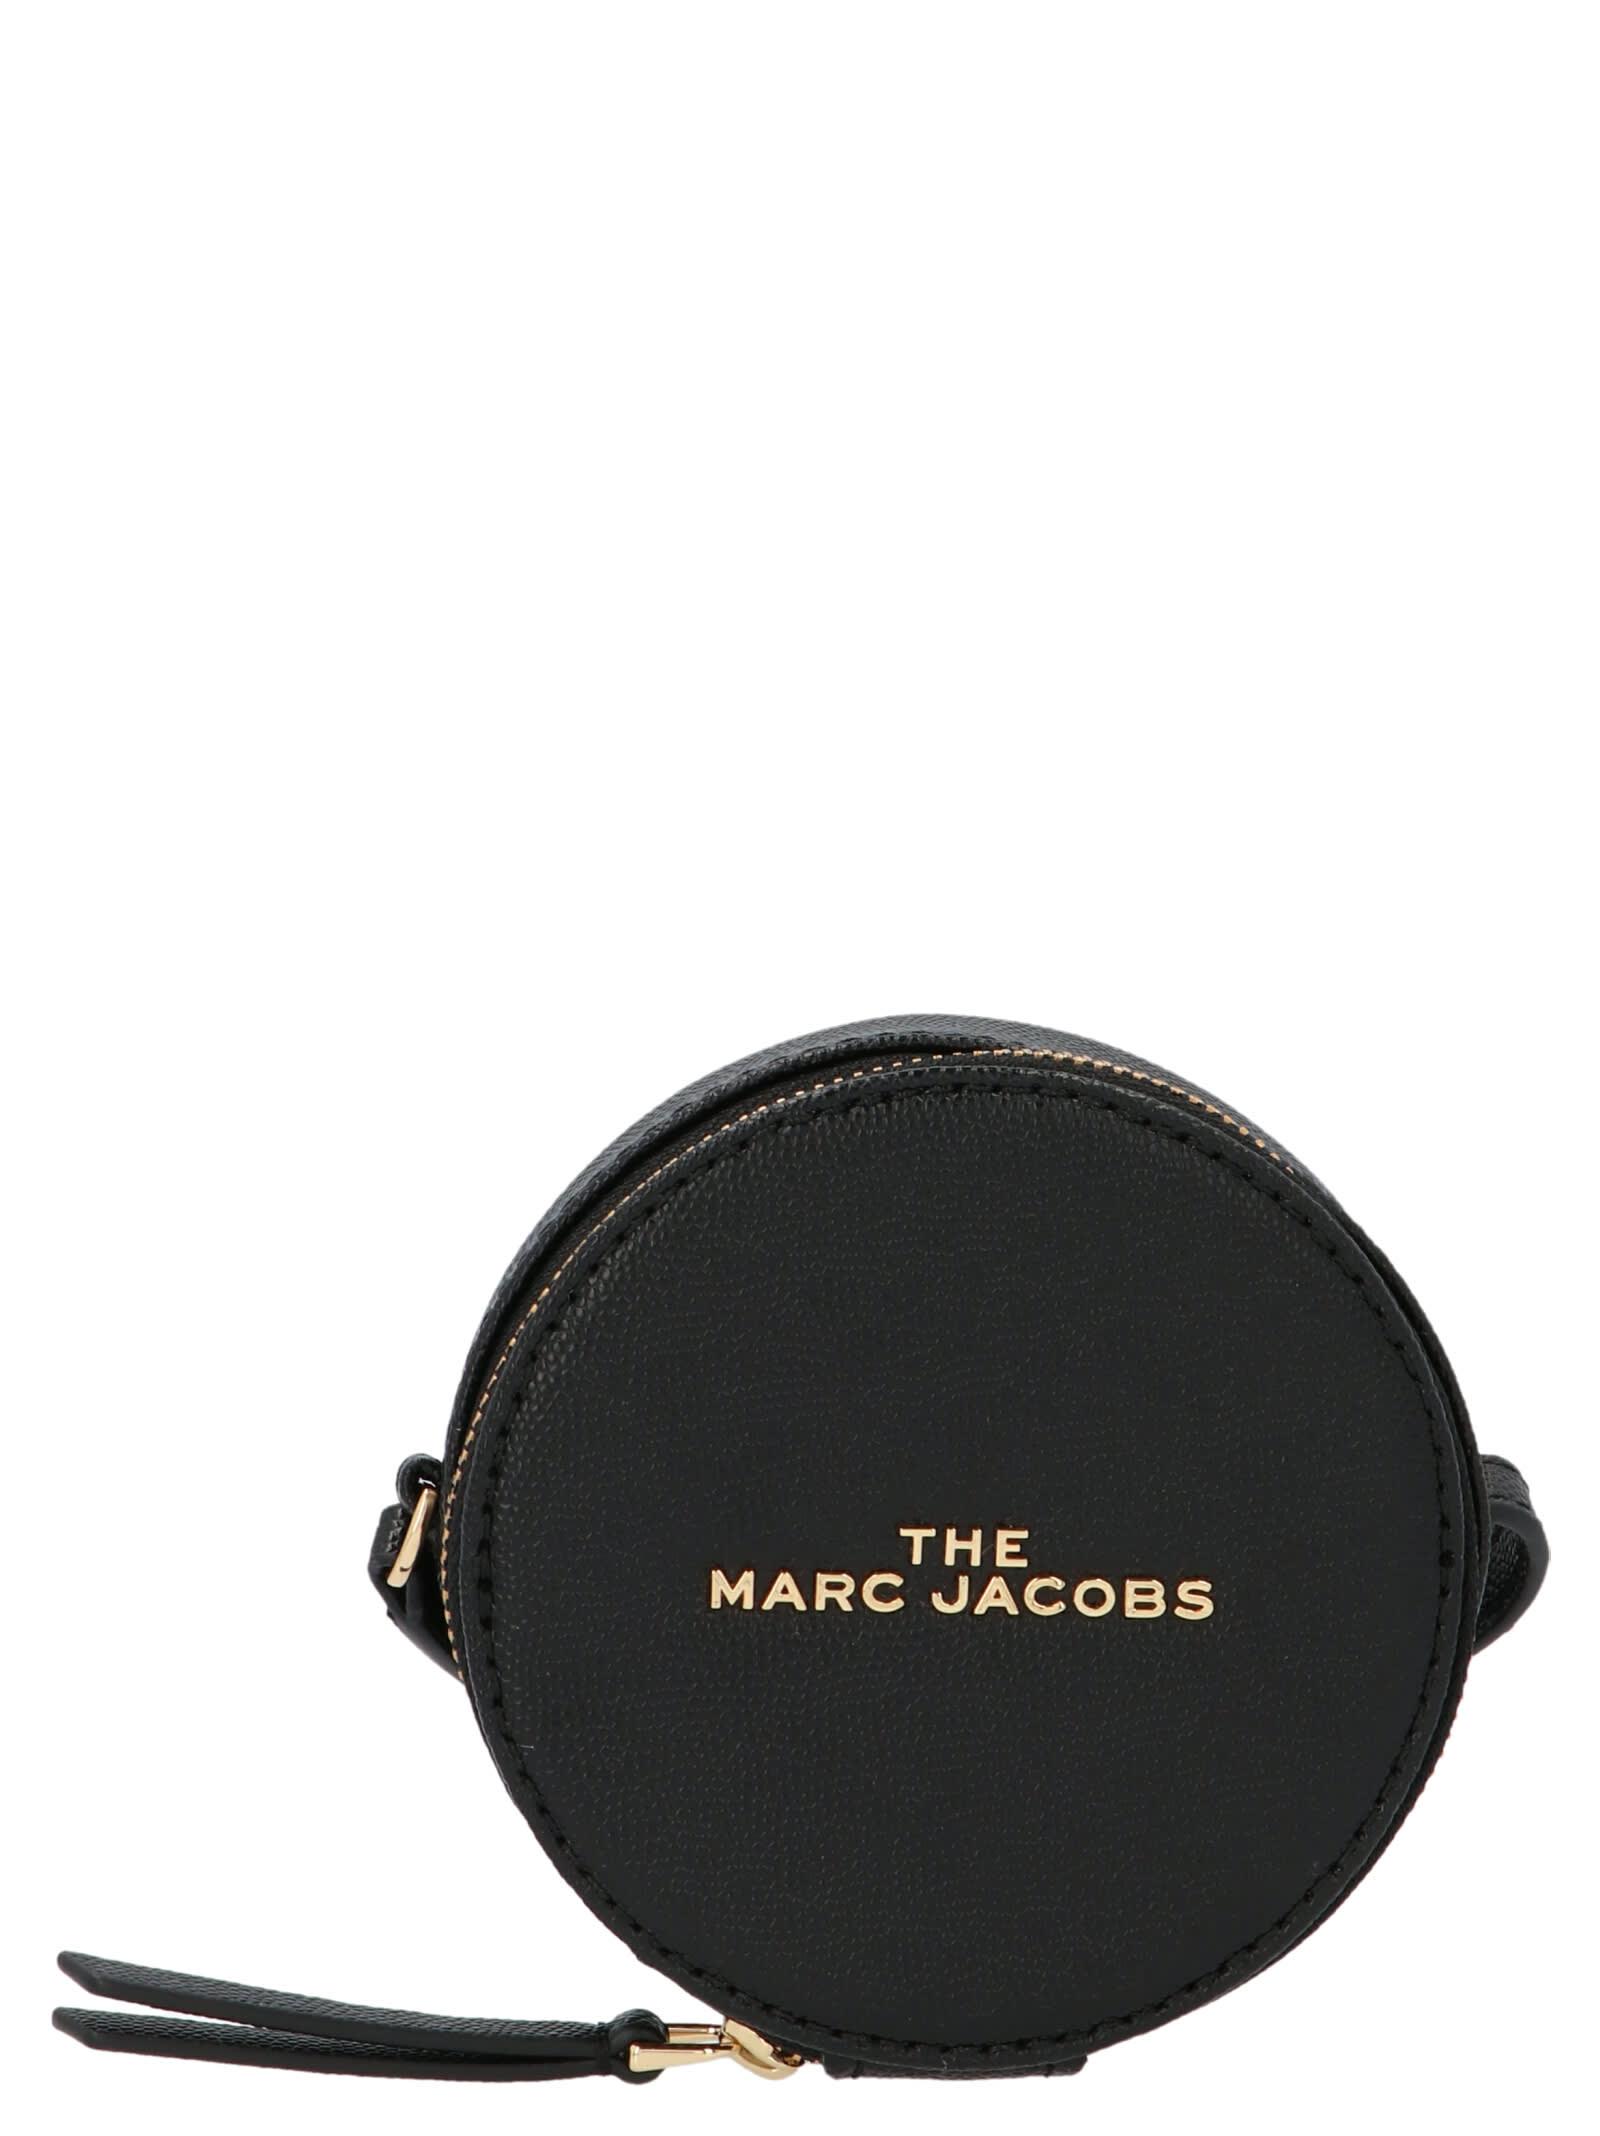 Marc Jacobs the Hot Spot Bag